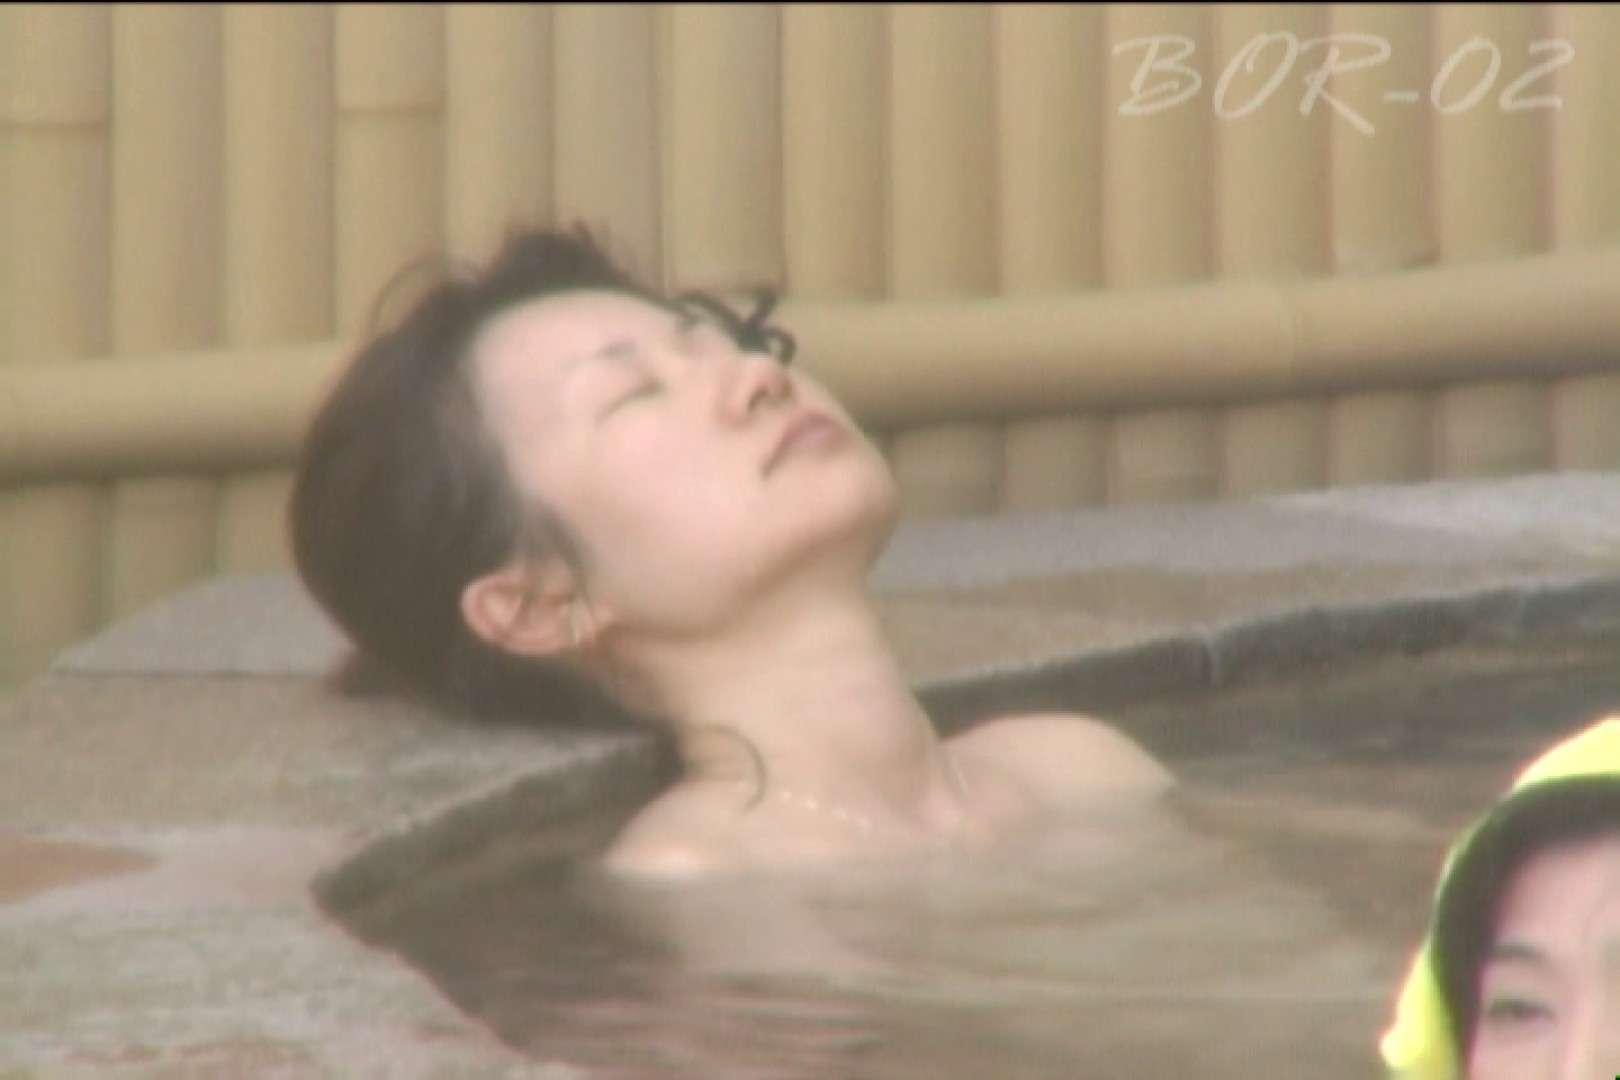 Aquaな露天風呂Vol.477 OLセックス 盗撮われめAV動画紹介 86画像 29